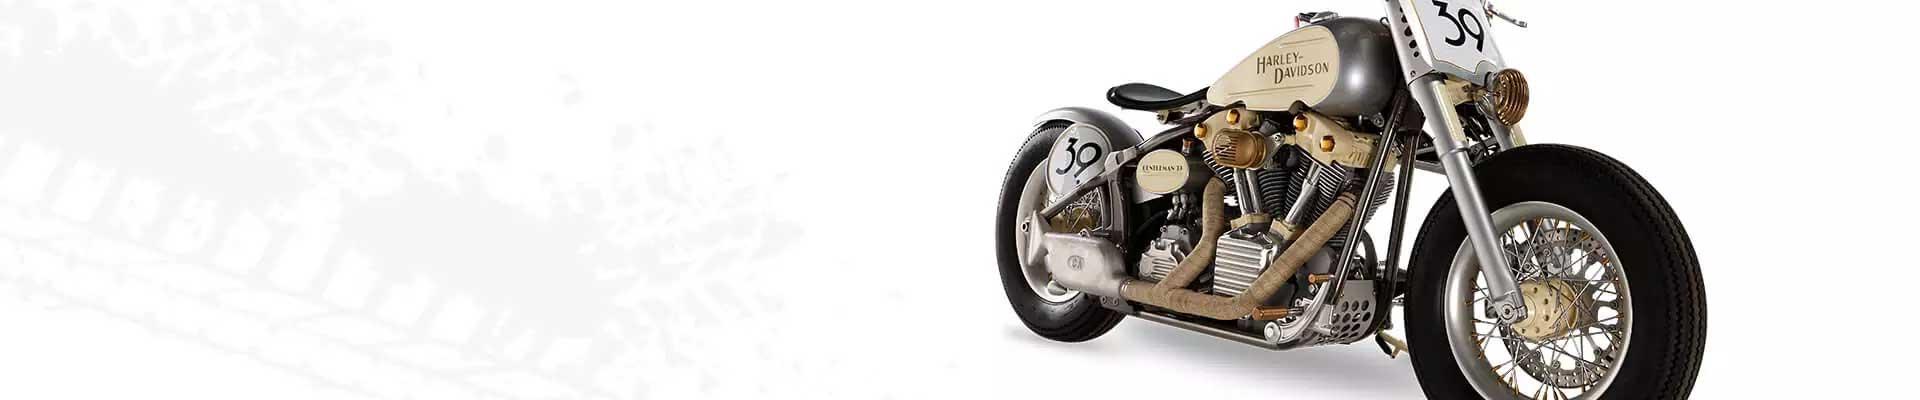 custom-bike-insurance